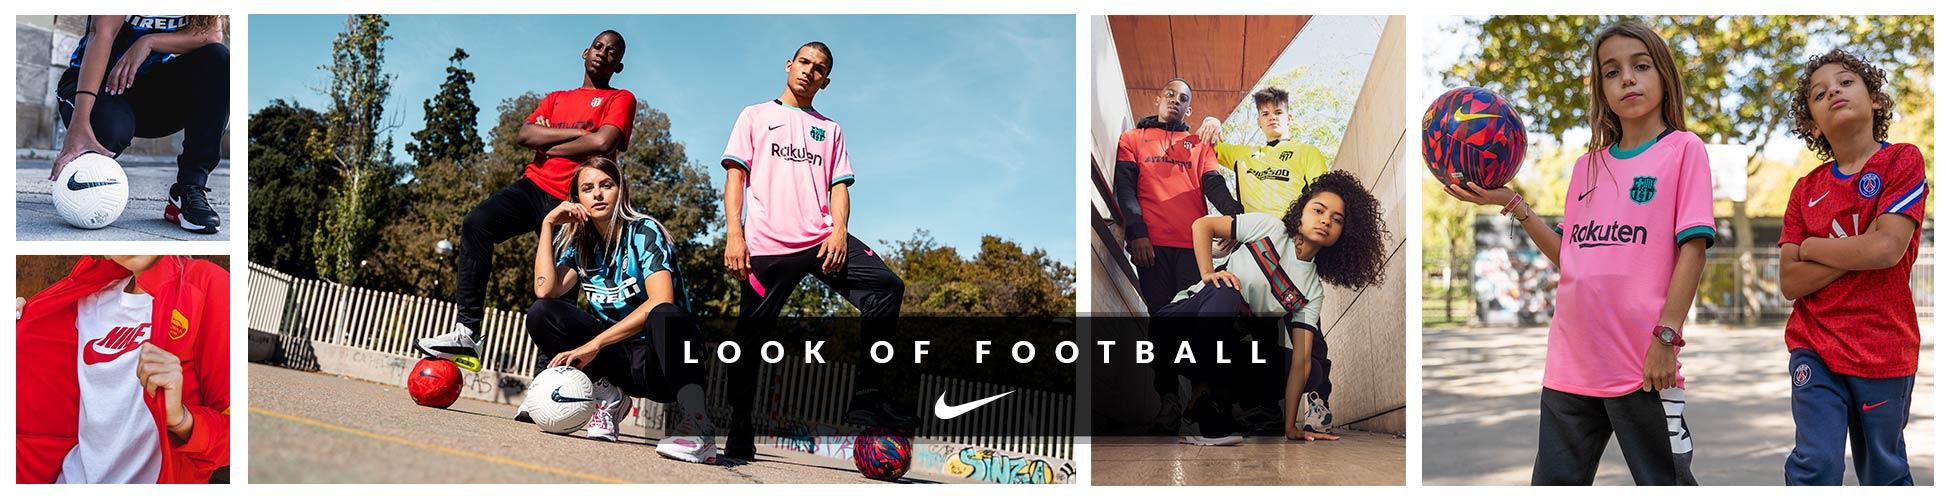 NIKE LOOK OF FOOTBAL NOVIEMBRE 2020